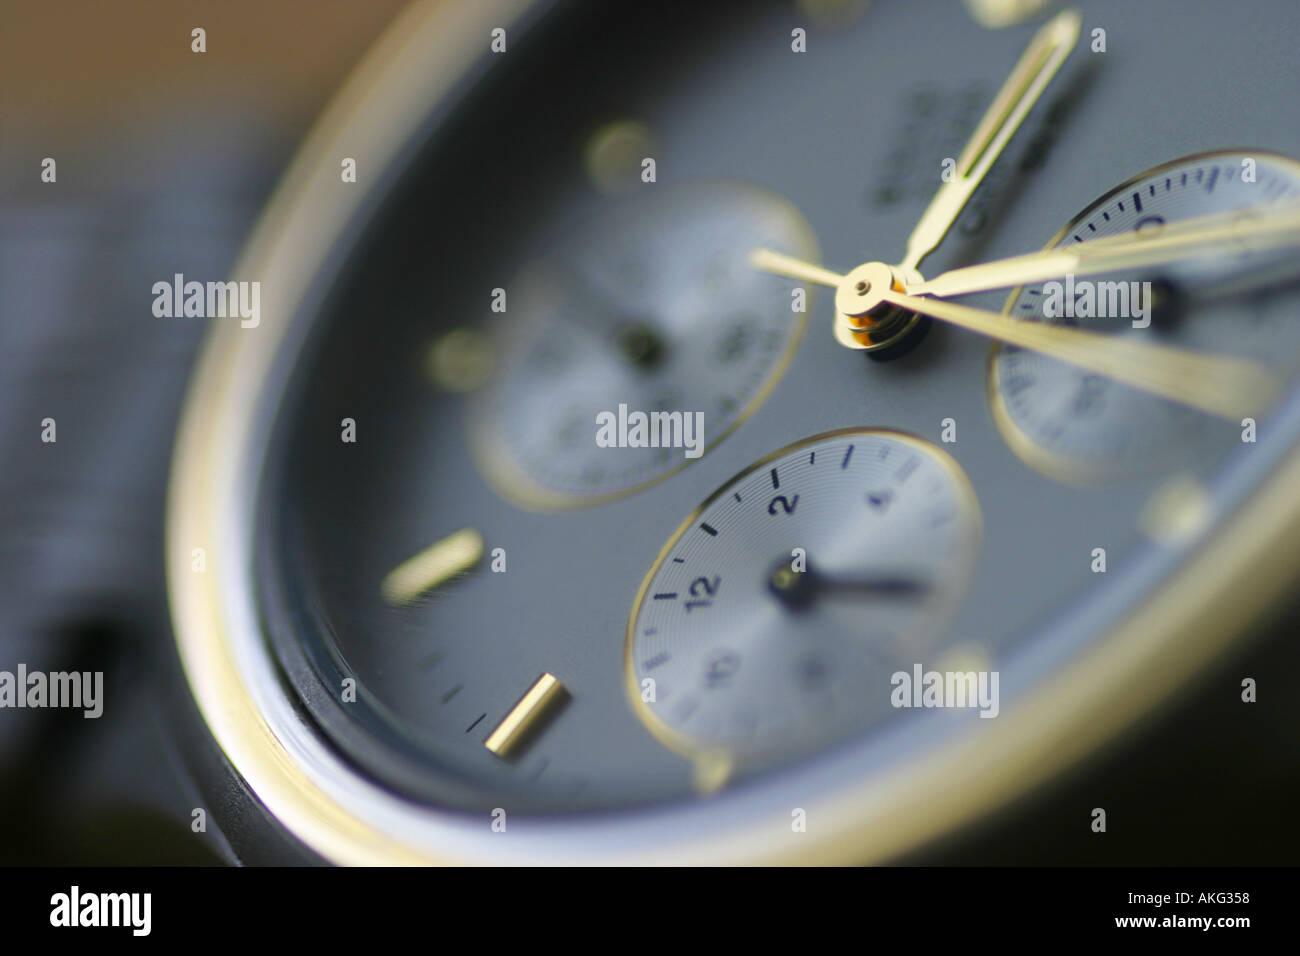 watch alarm chroniker chronograph chronometer Stock Photo